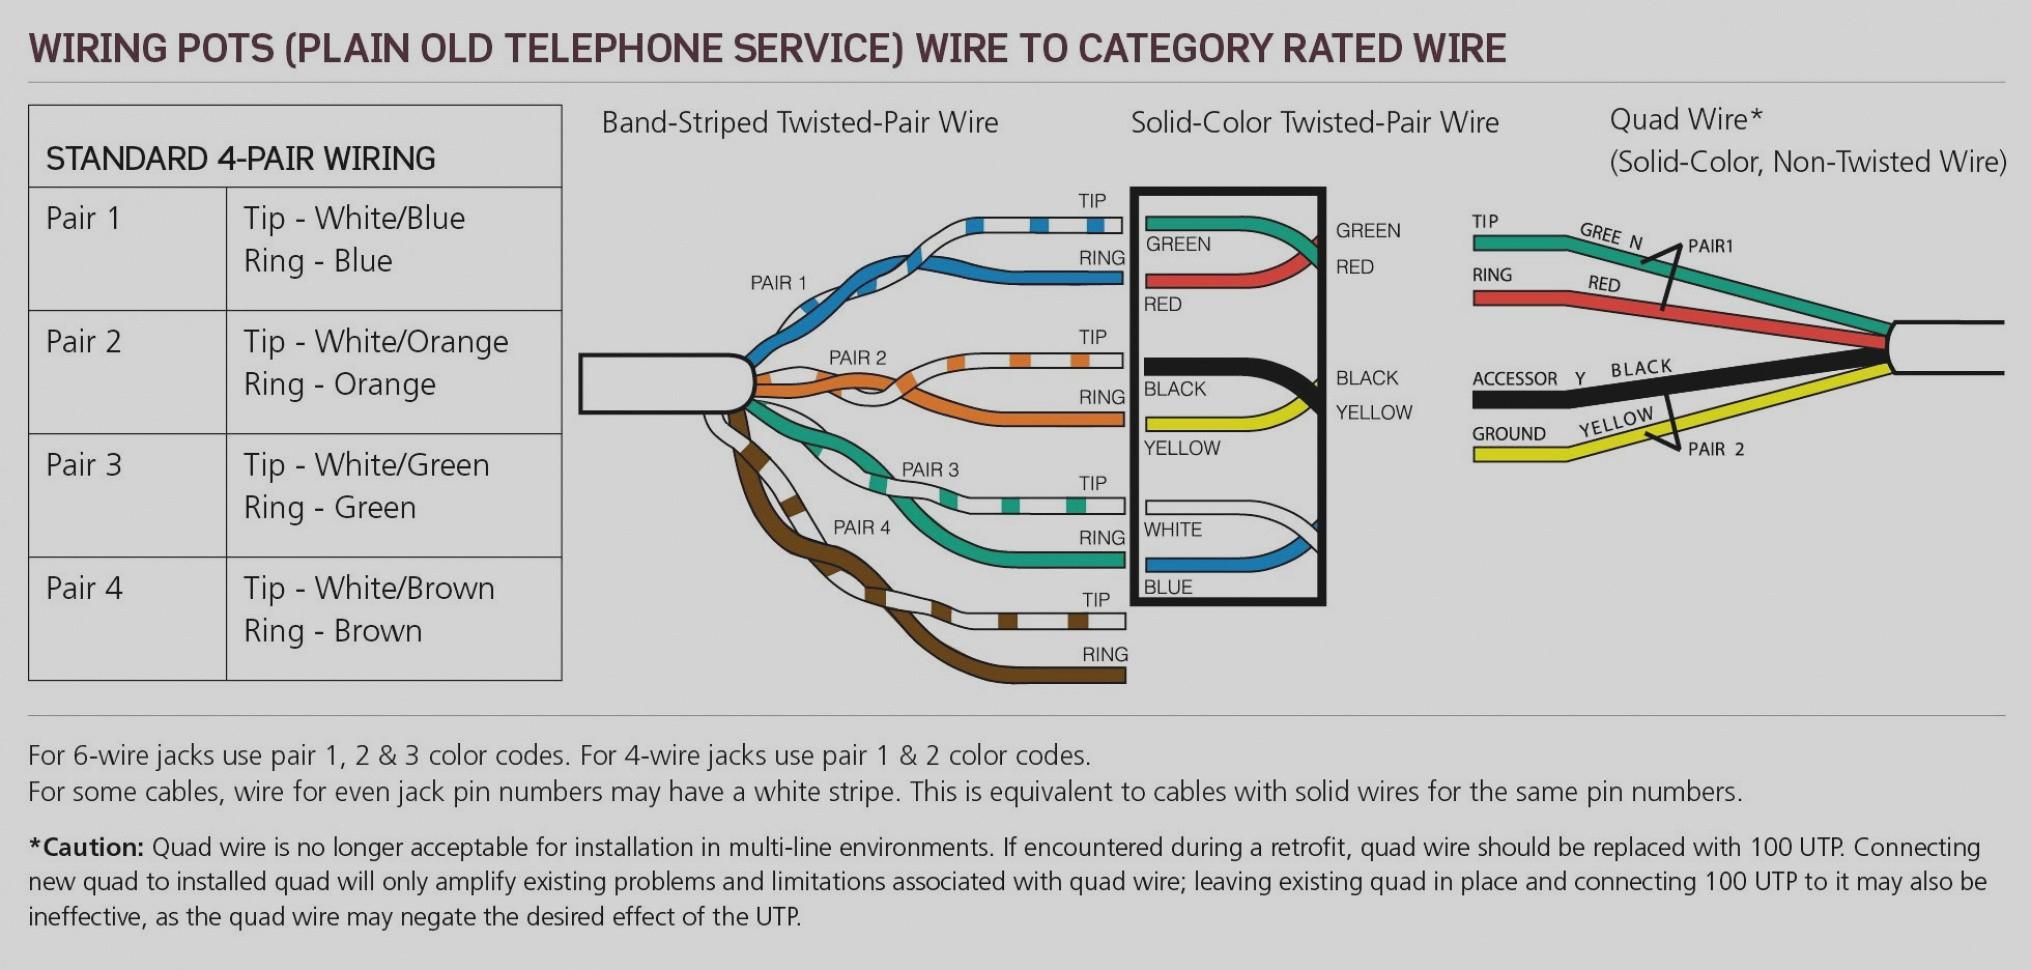 Home Phone Wiring Color Code - Wiring Diagram Detailed - Phone Jack Wiring Diagram